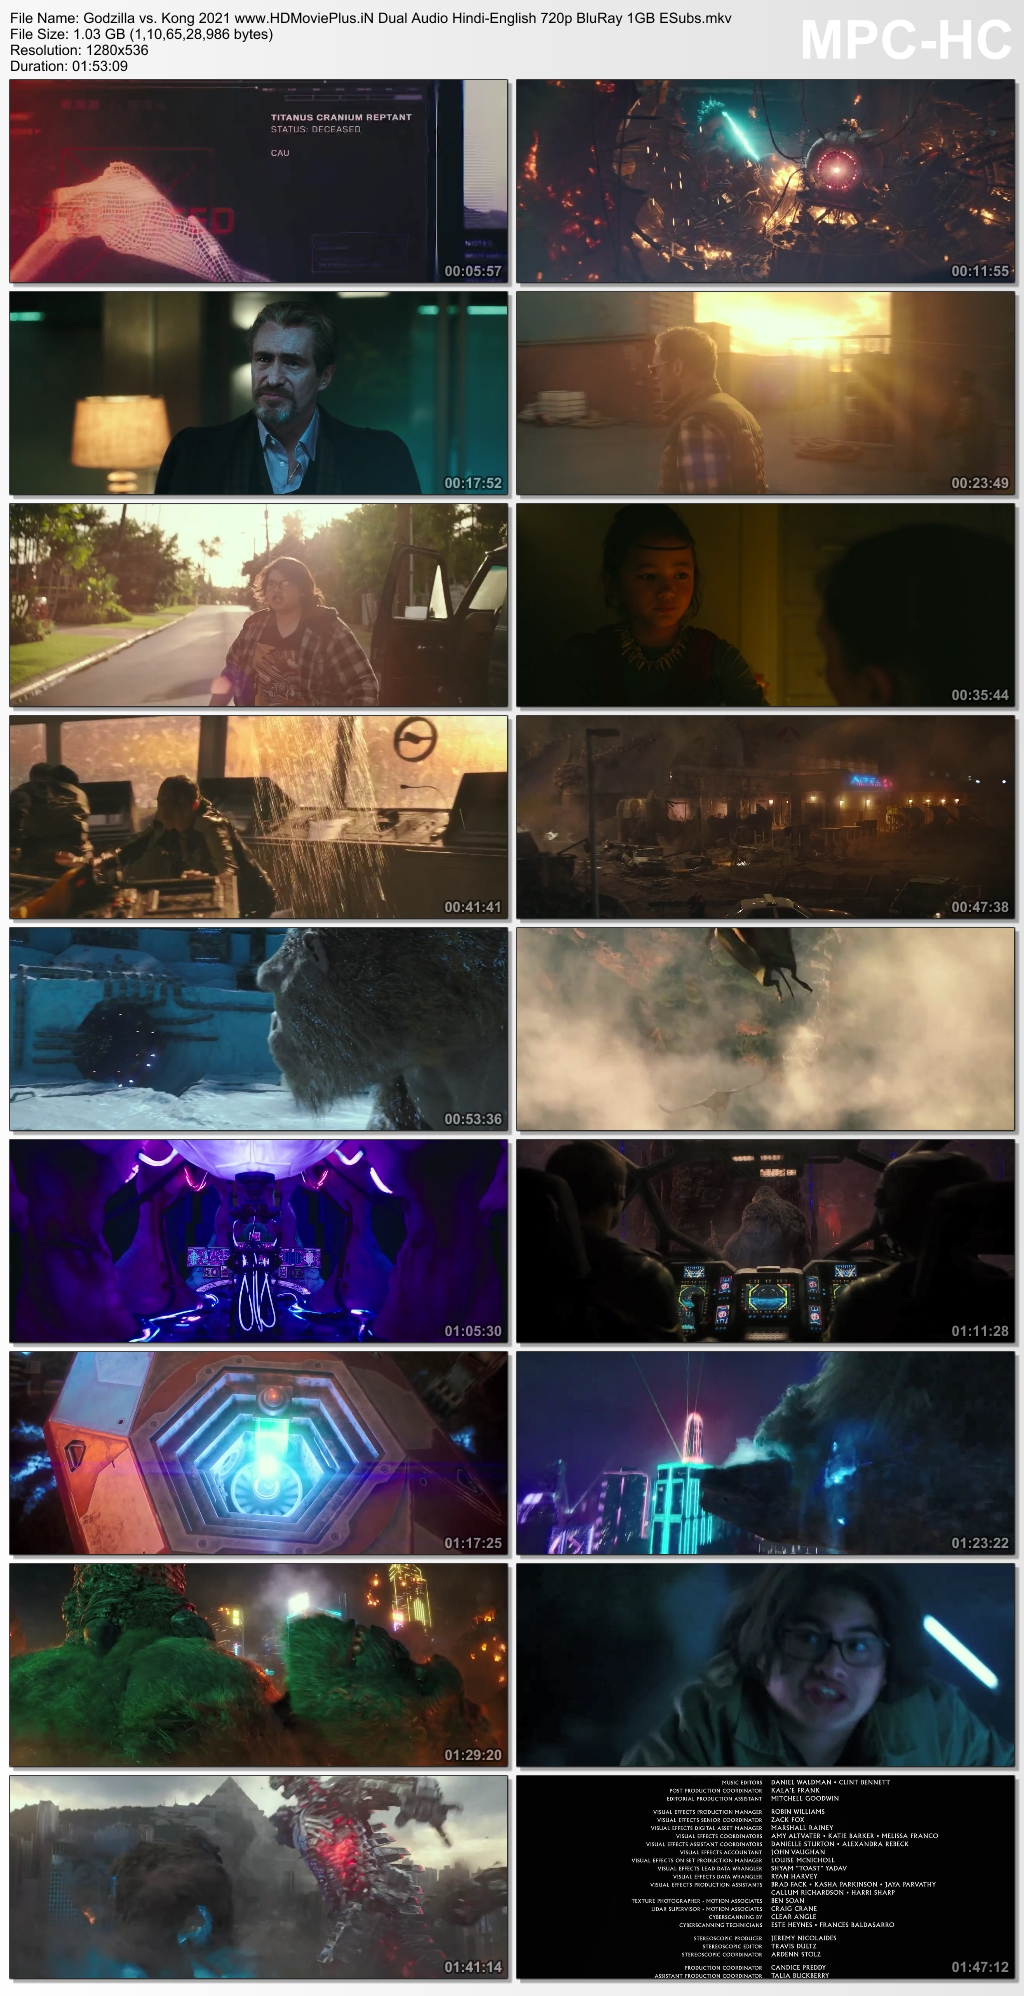 Godzilla vs. Kong 2021 Dual Audio